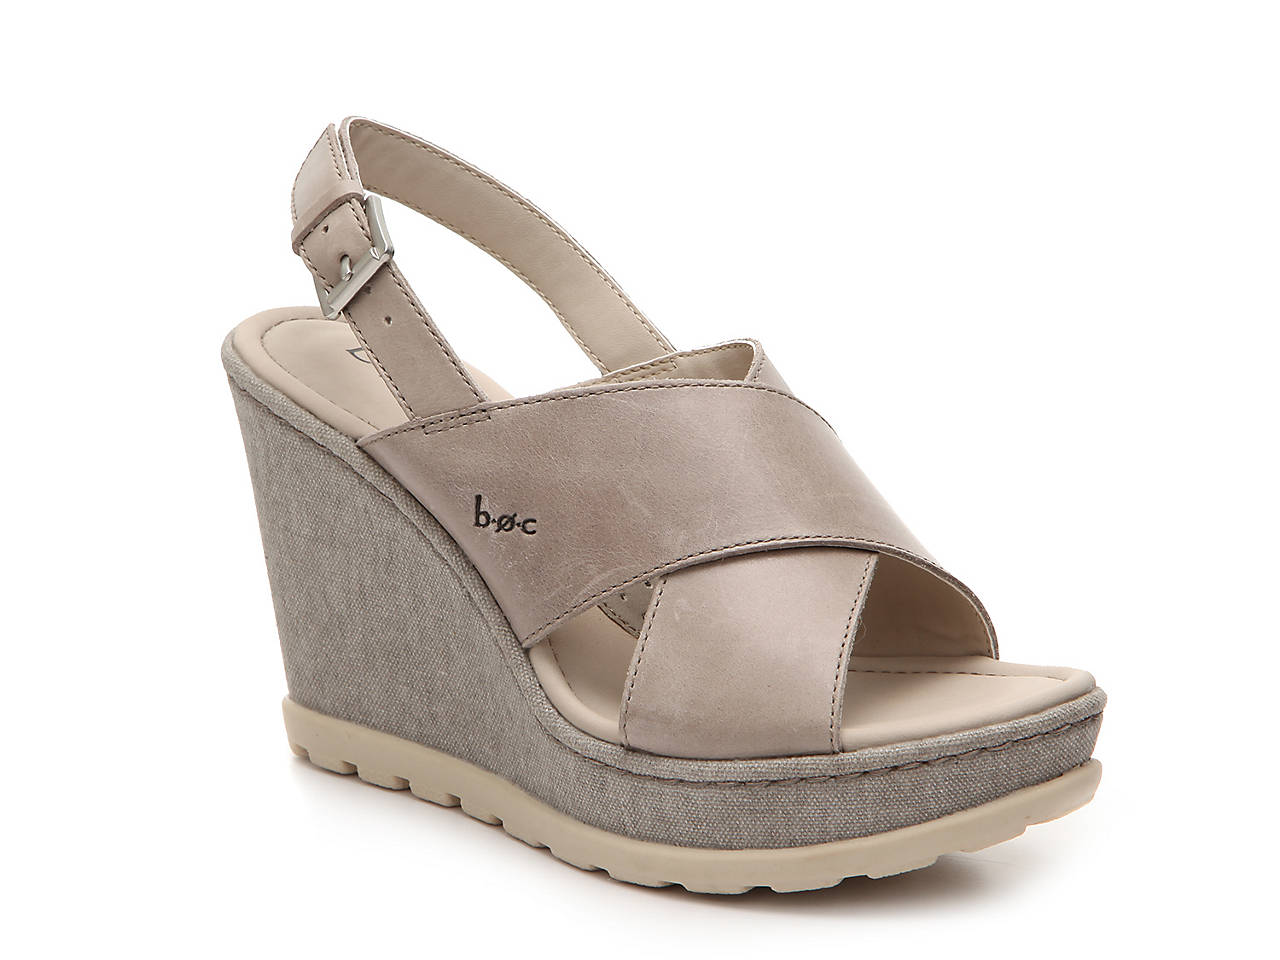 4ca67a617c7f b.o.c Dannah Wedge Sandal Women s Shoes